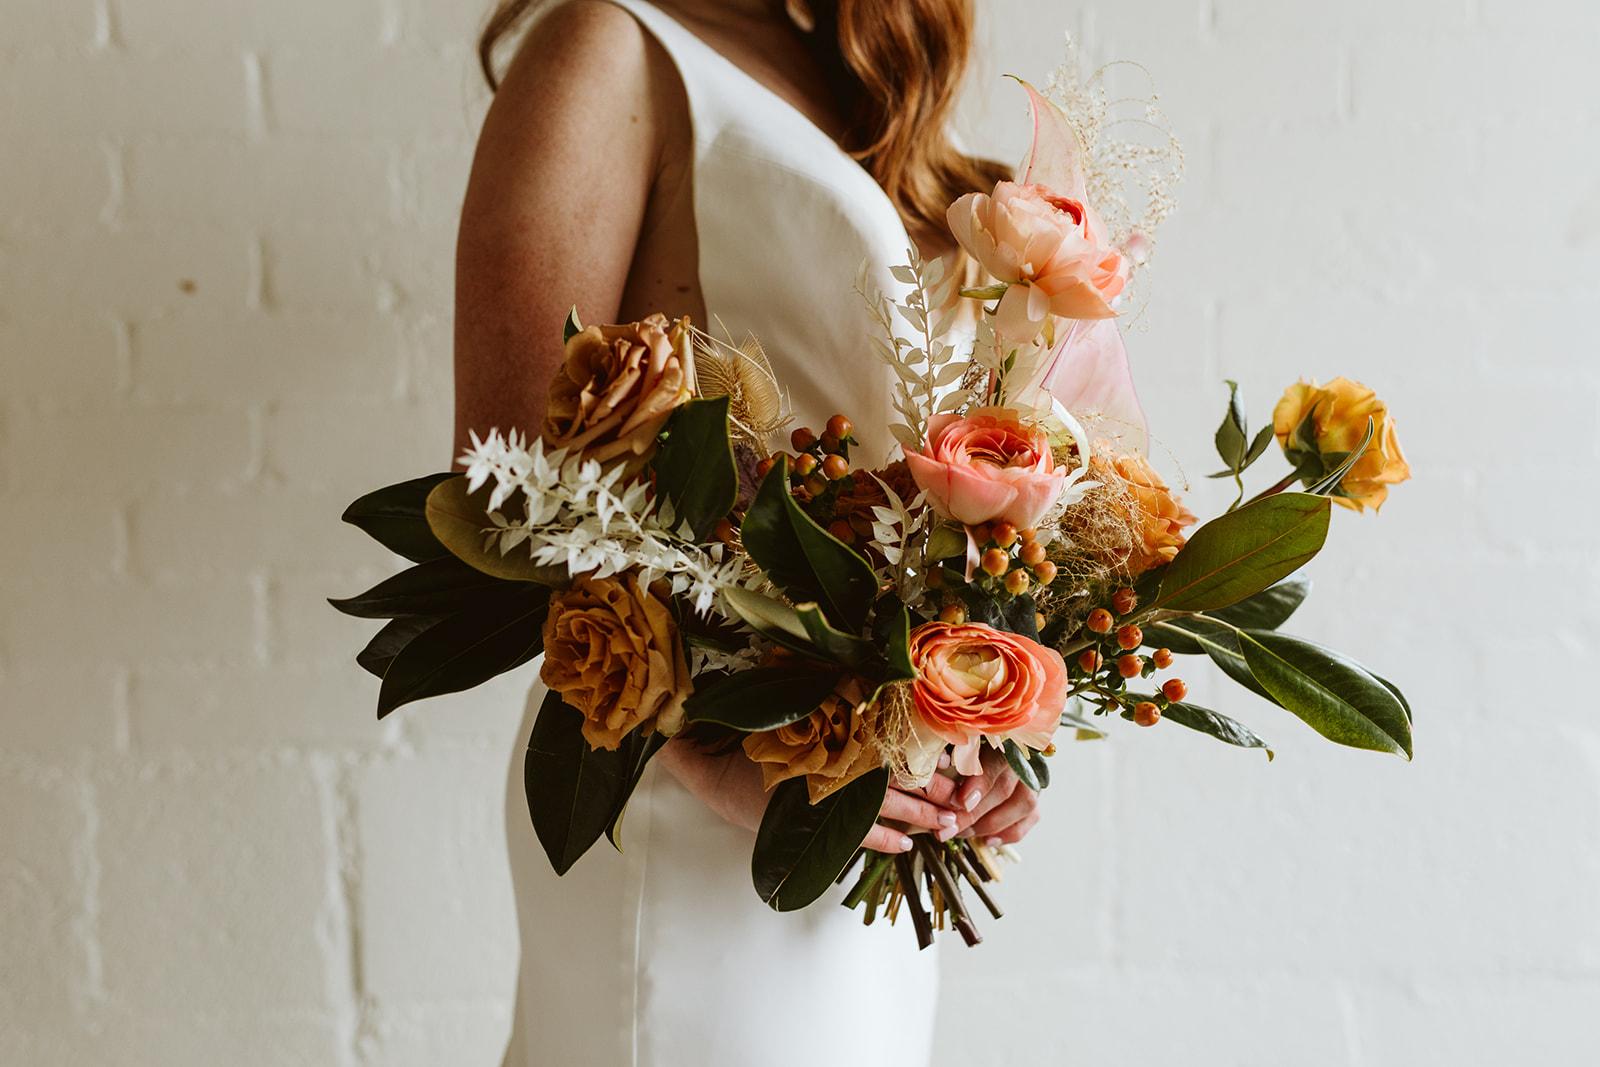 boho bouquet. boho bride. boho wedding. asymmetrical bouquet. wildflower bouquet. rose bouquet. airy modern wedding. bright wedding. natural wedding. peach wedding color. pink wedding color. peach flowers. blush wedding. eclectic wedding.